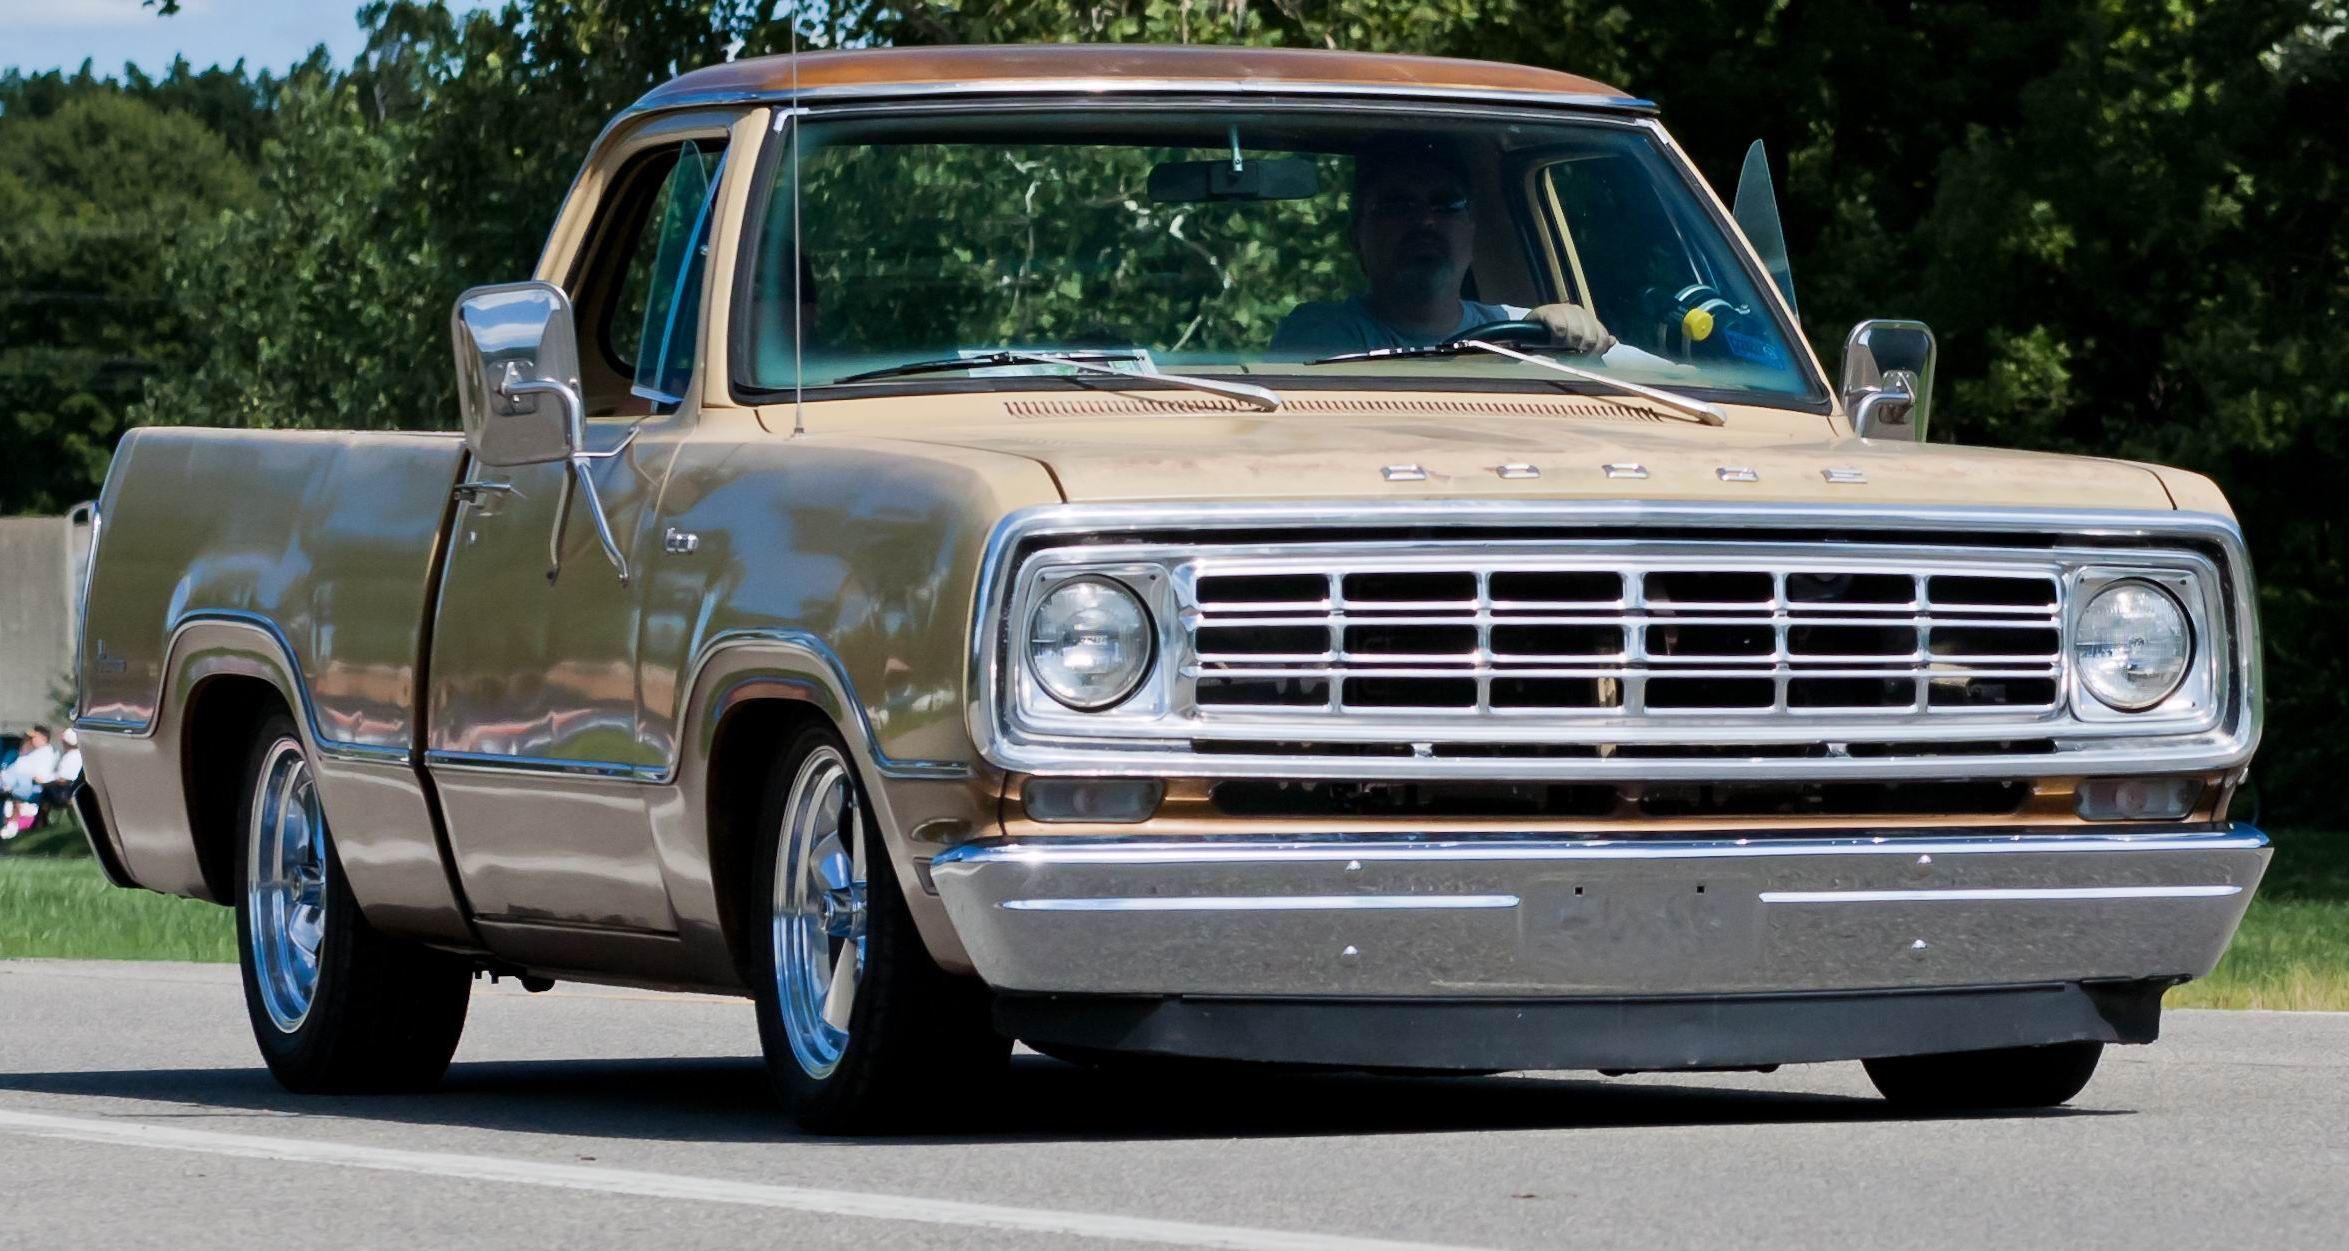 1972 80 Dodge Pickup Truck Camioneta Dodge Camionetas Dodge